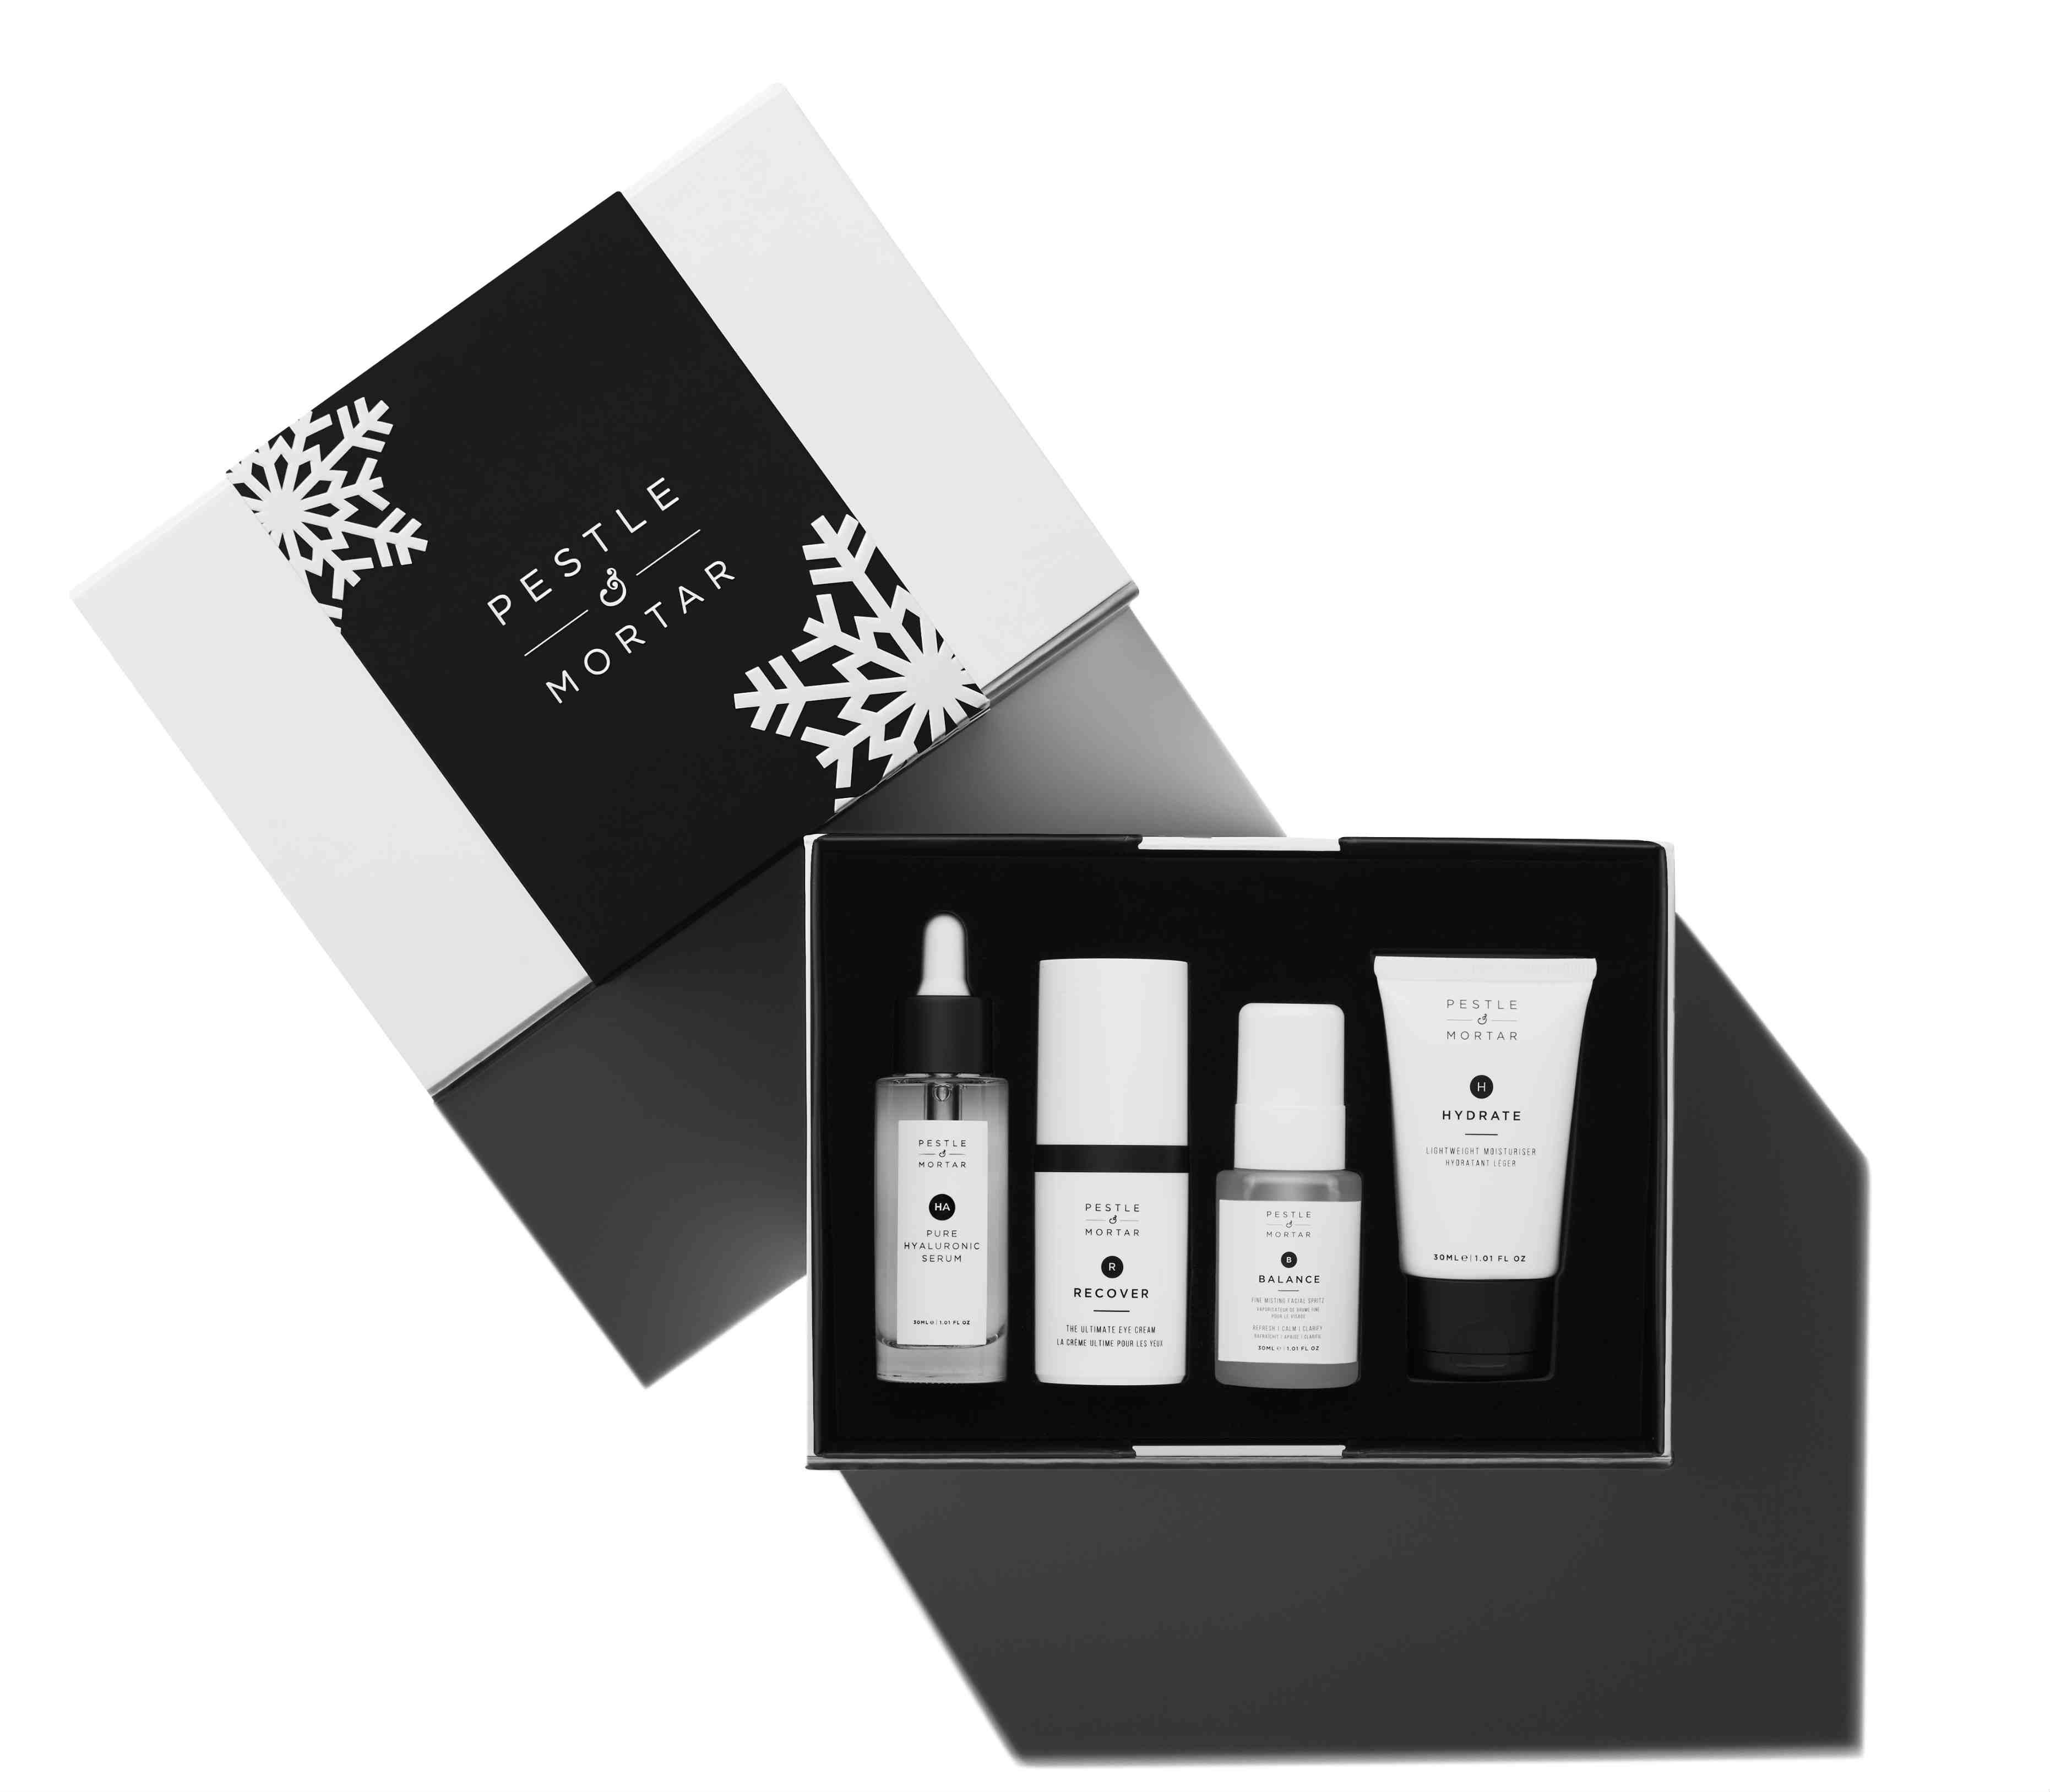 Pestle & Mortar x 4 Gift Boxes